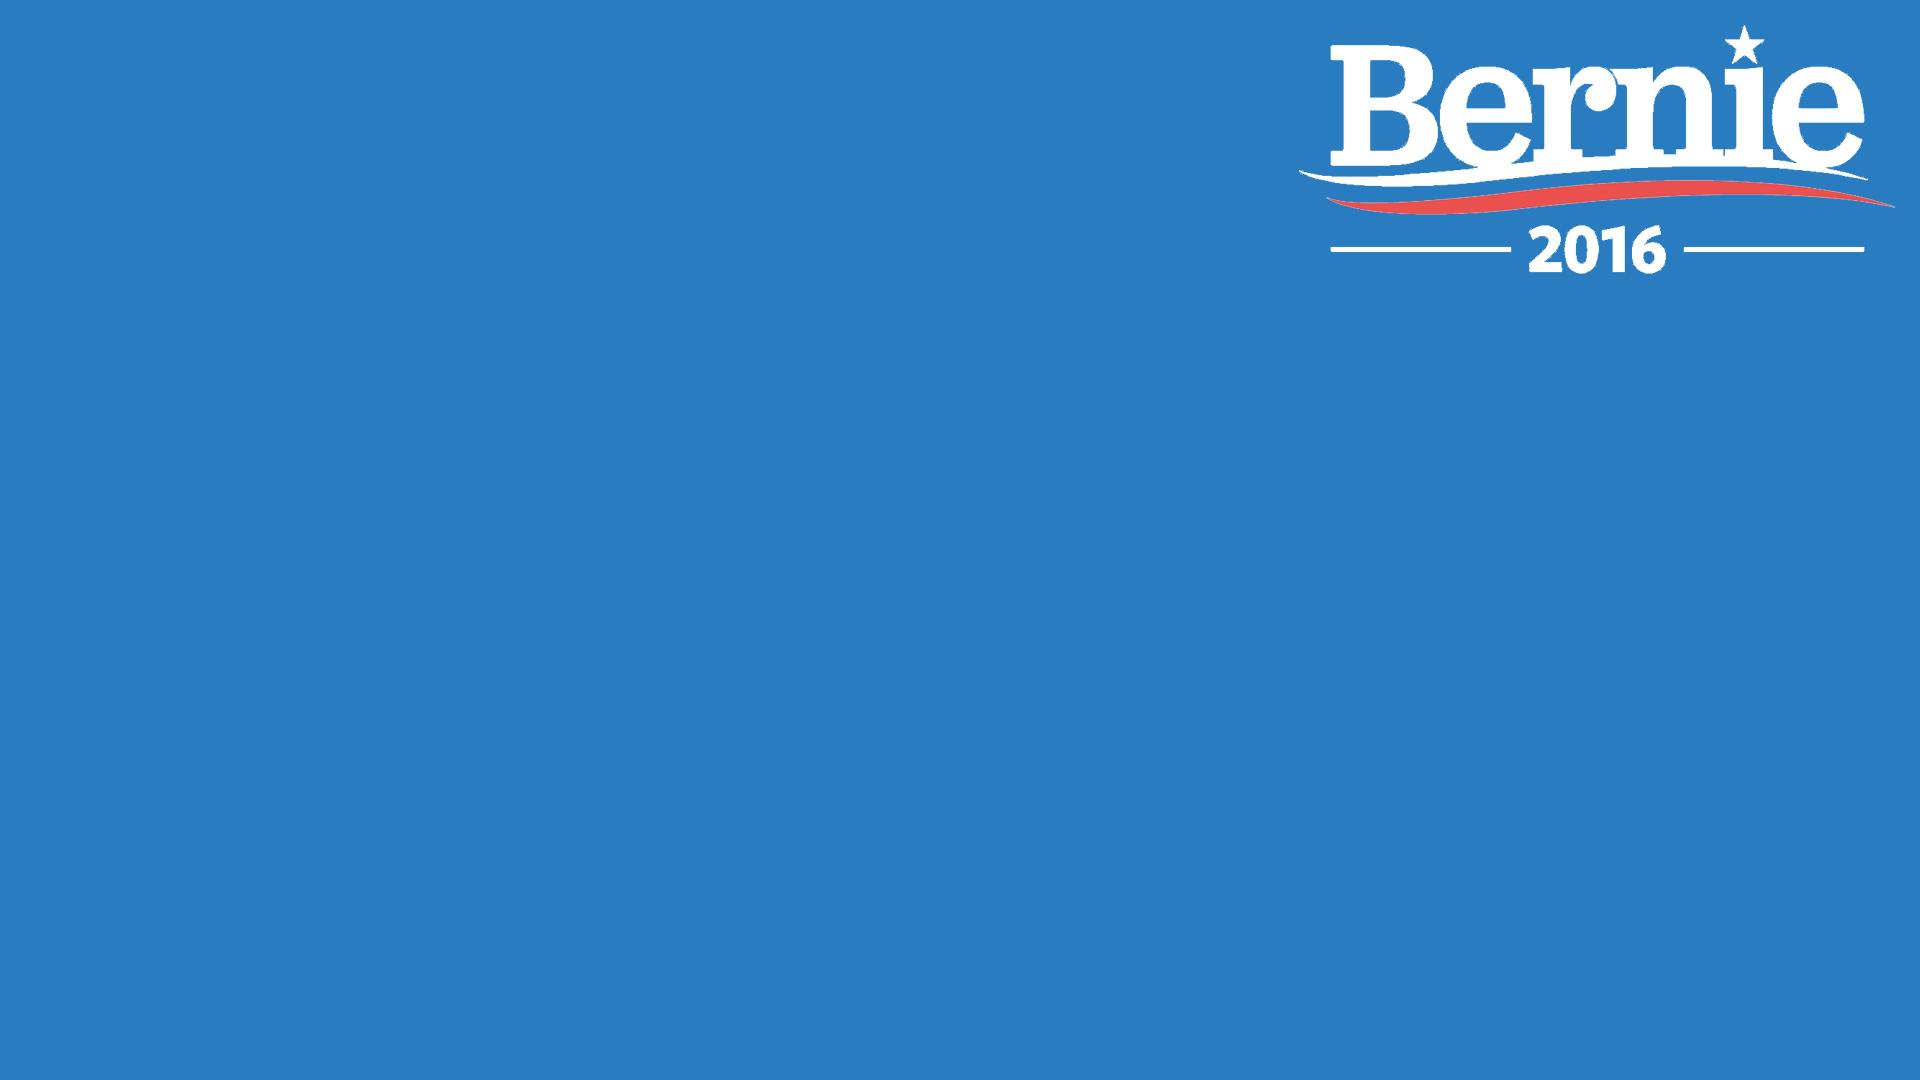 Best 51 Bernie Wallpaper on HipWallpaper Bernie Sanders 1920x1080